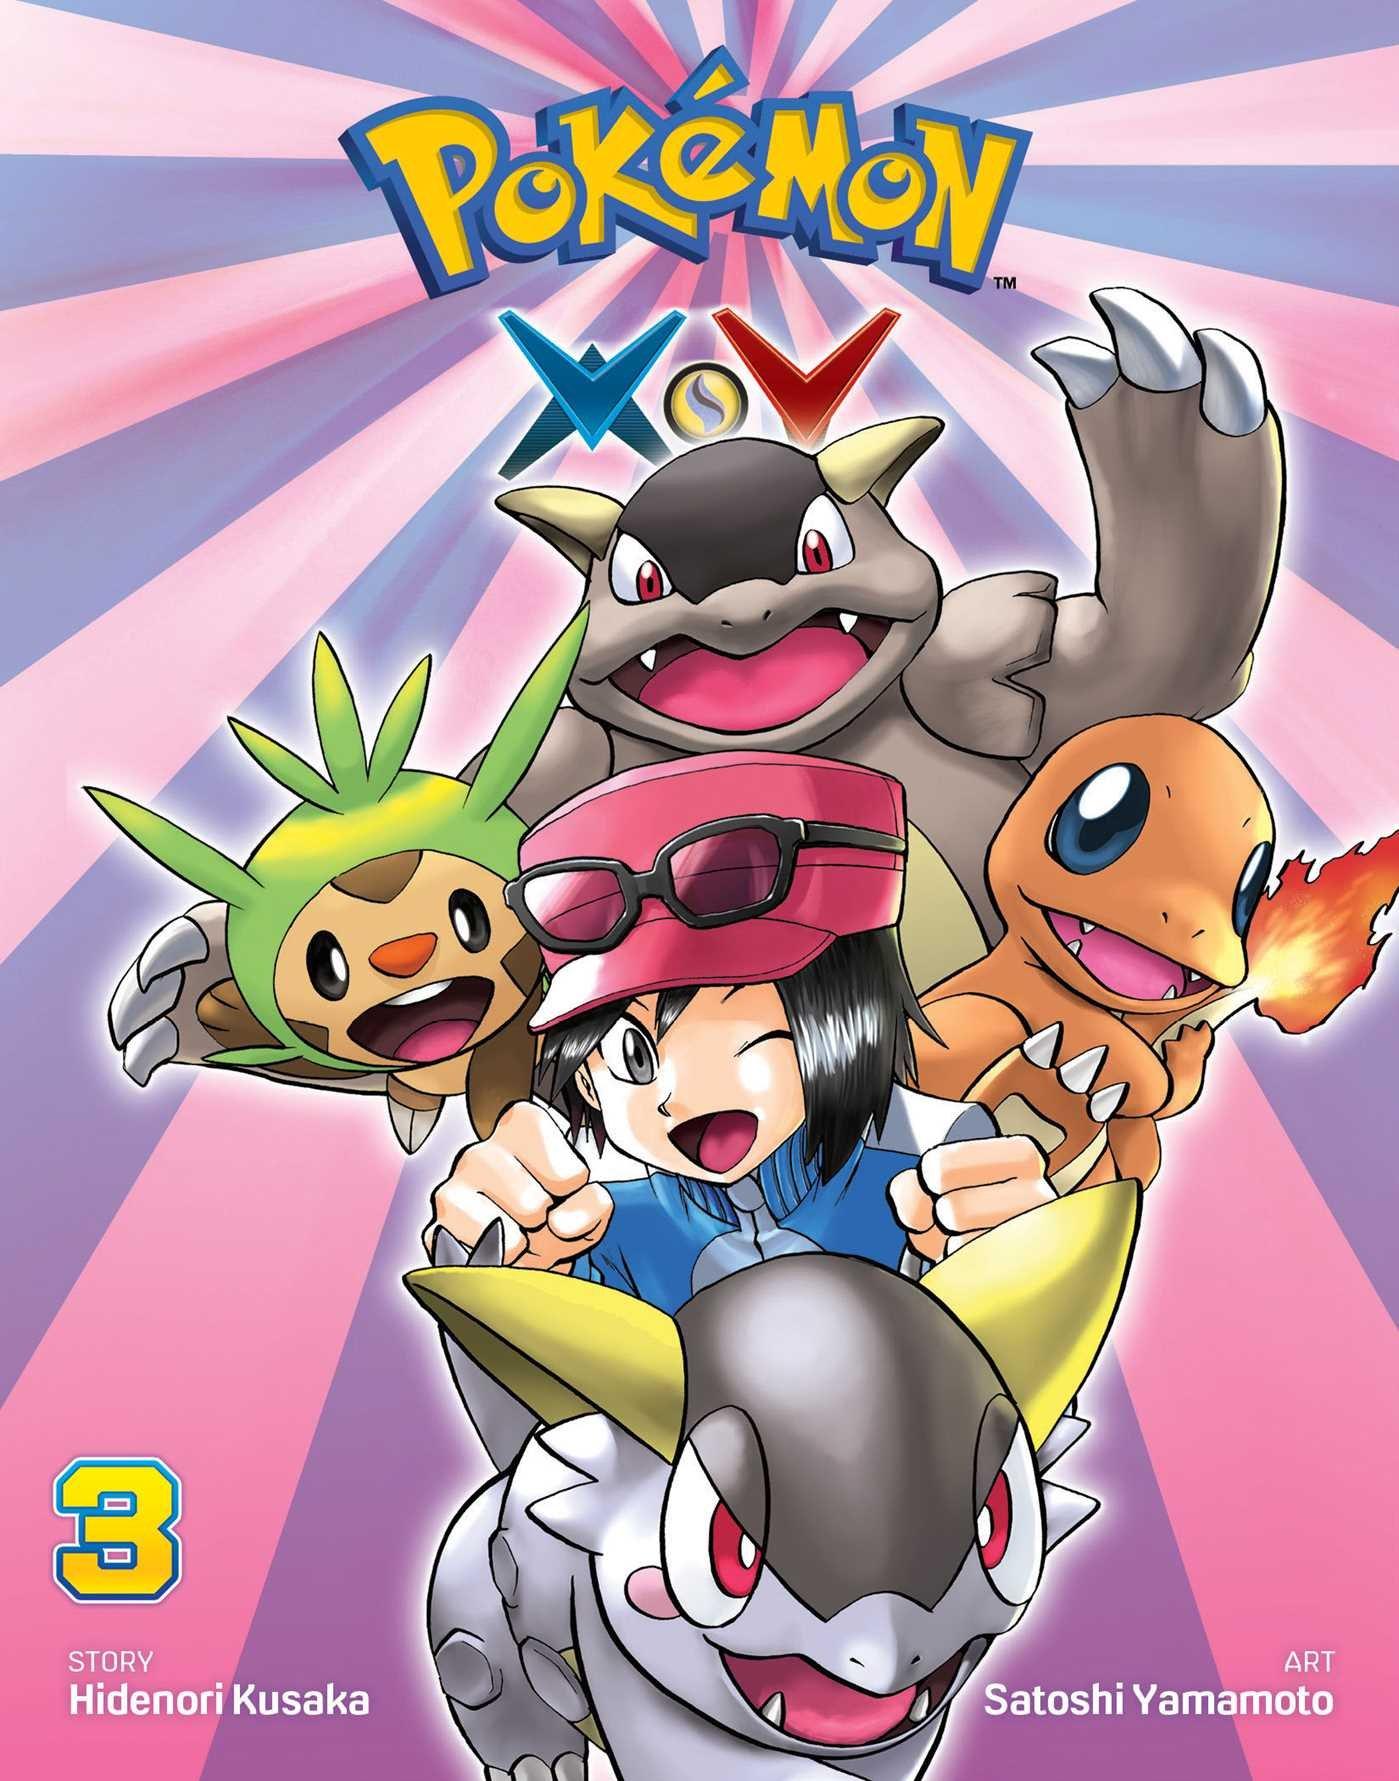 Pok%C3%A9mon X Y Vol 3 Pokemon product image